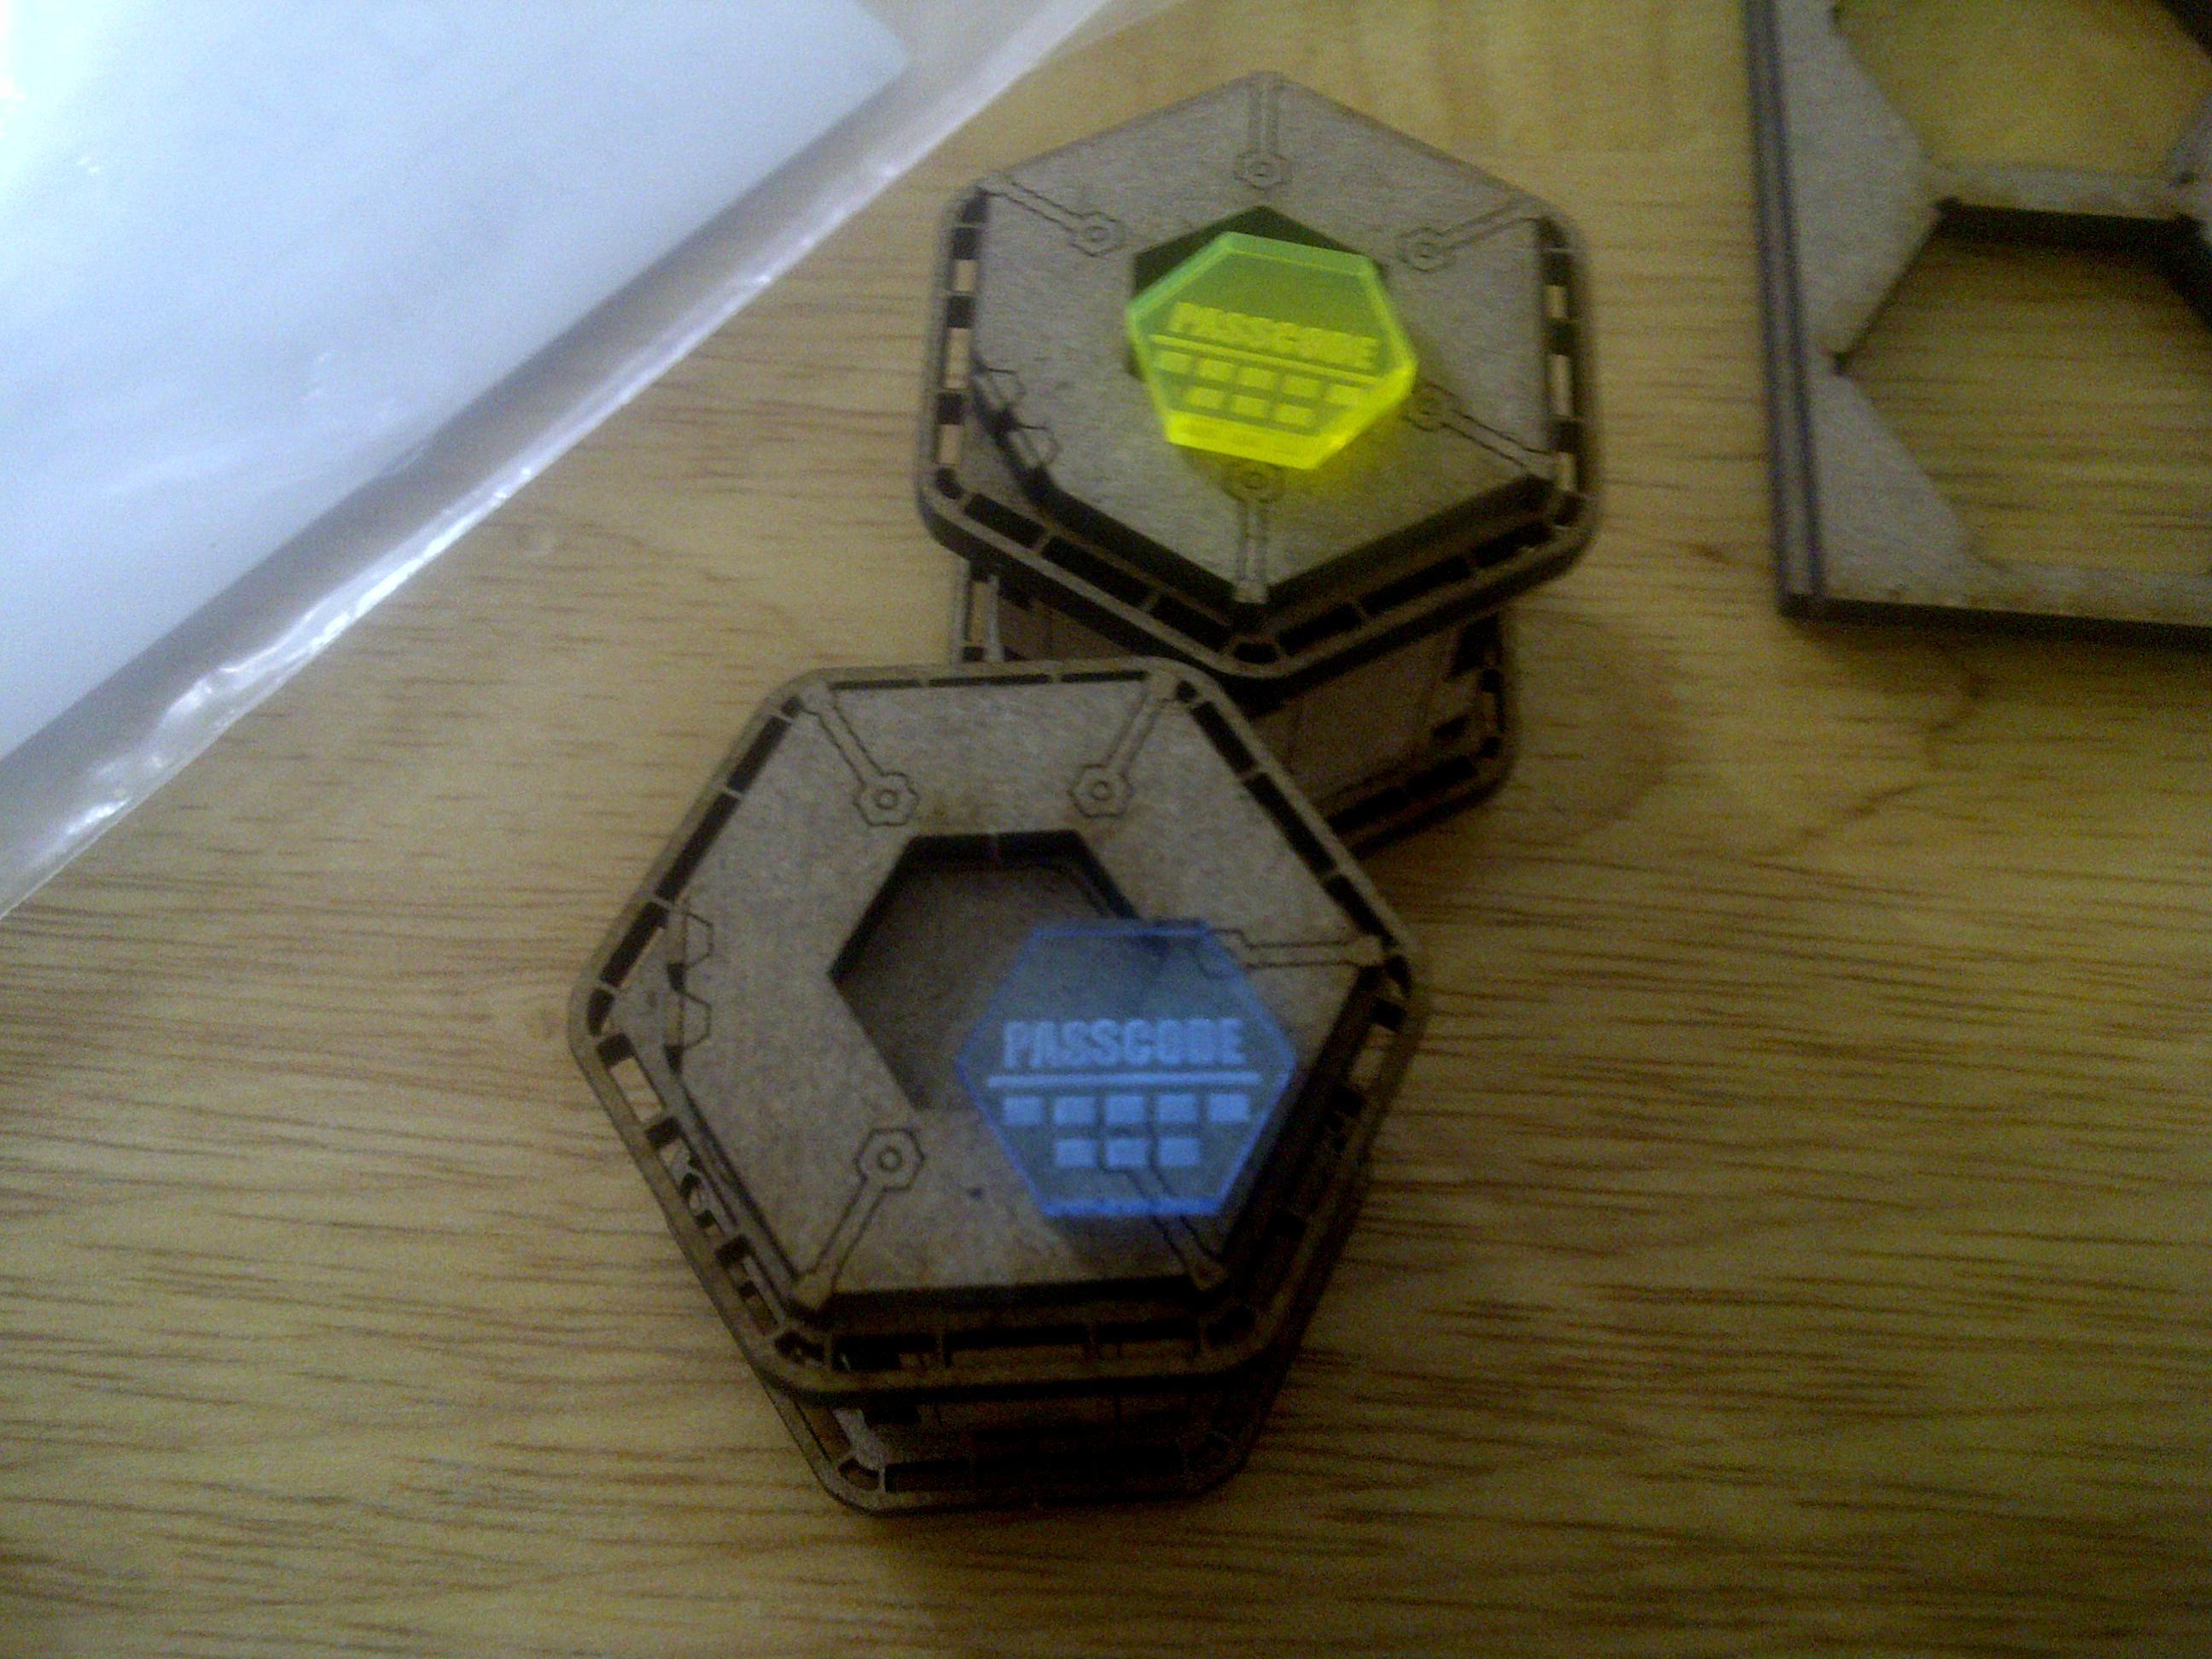 Crate 09